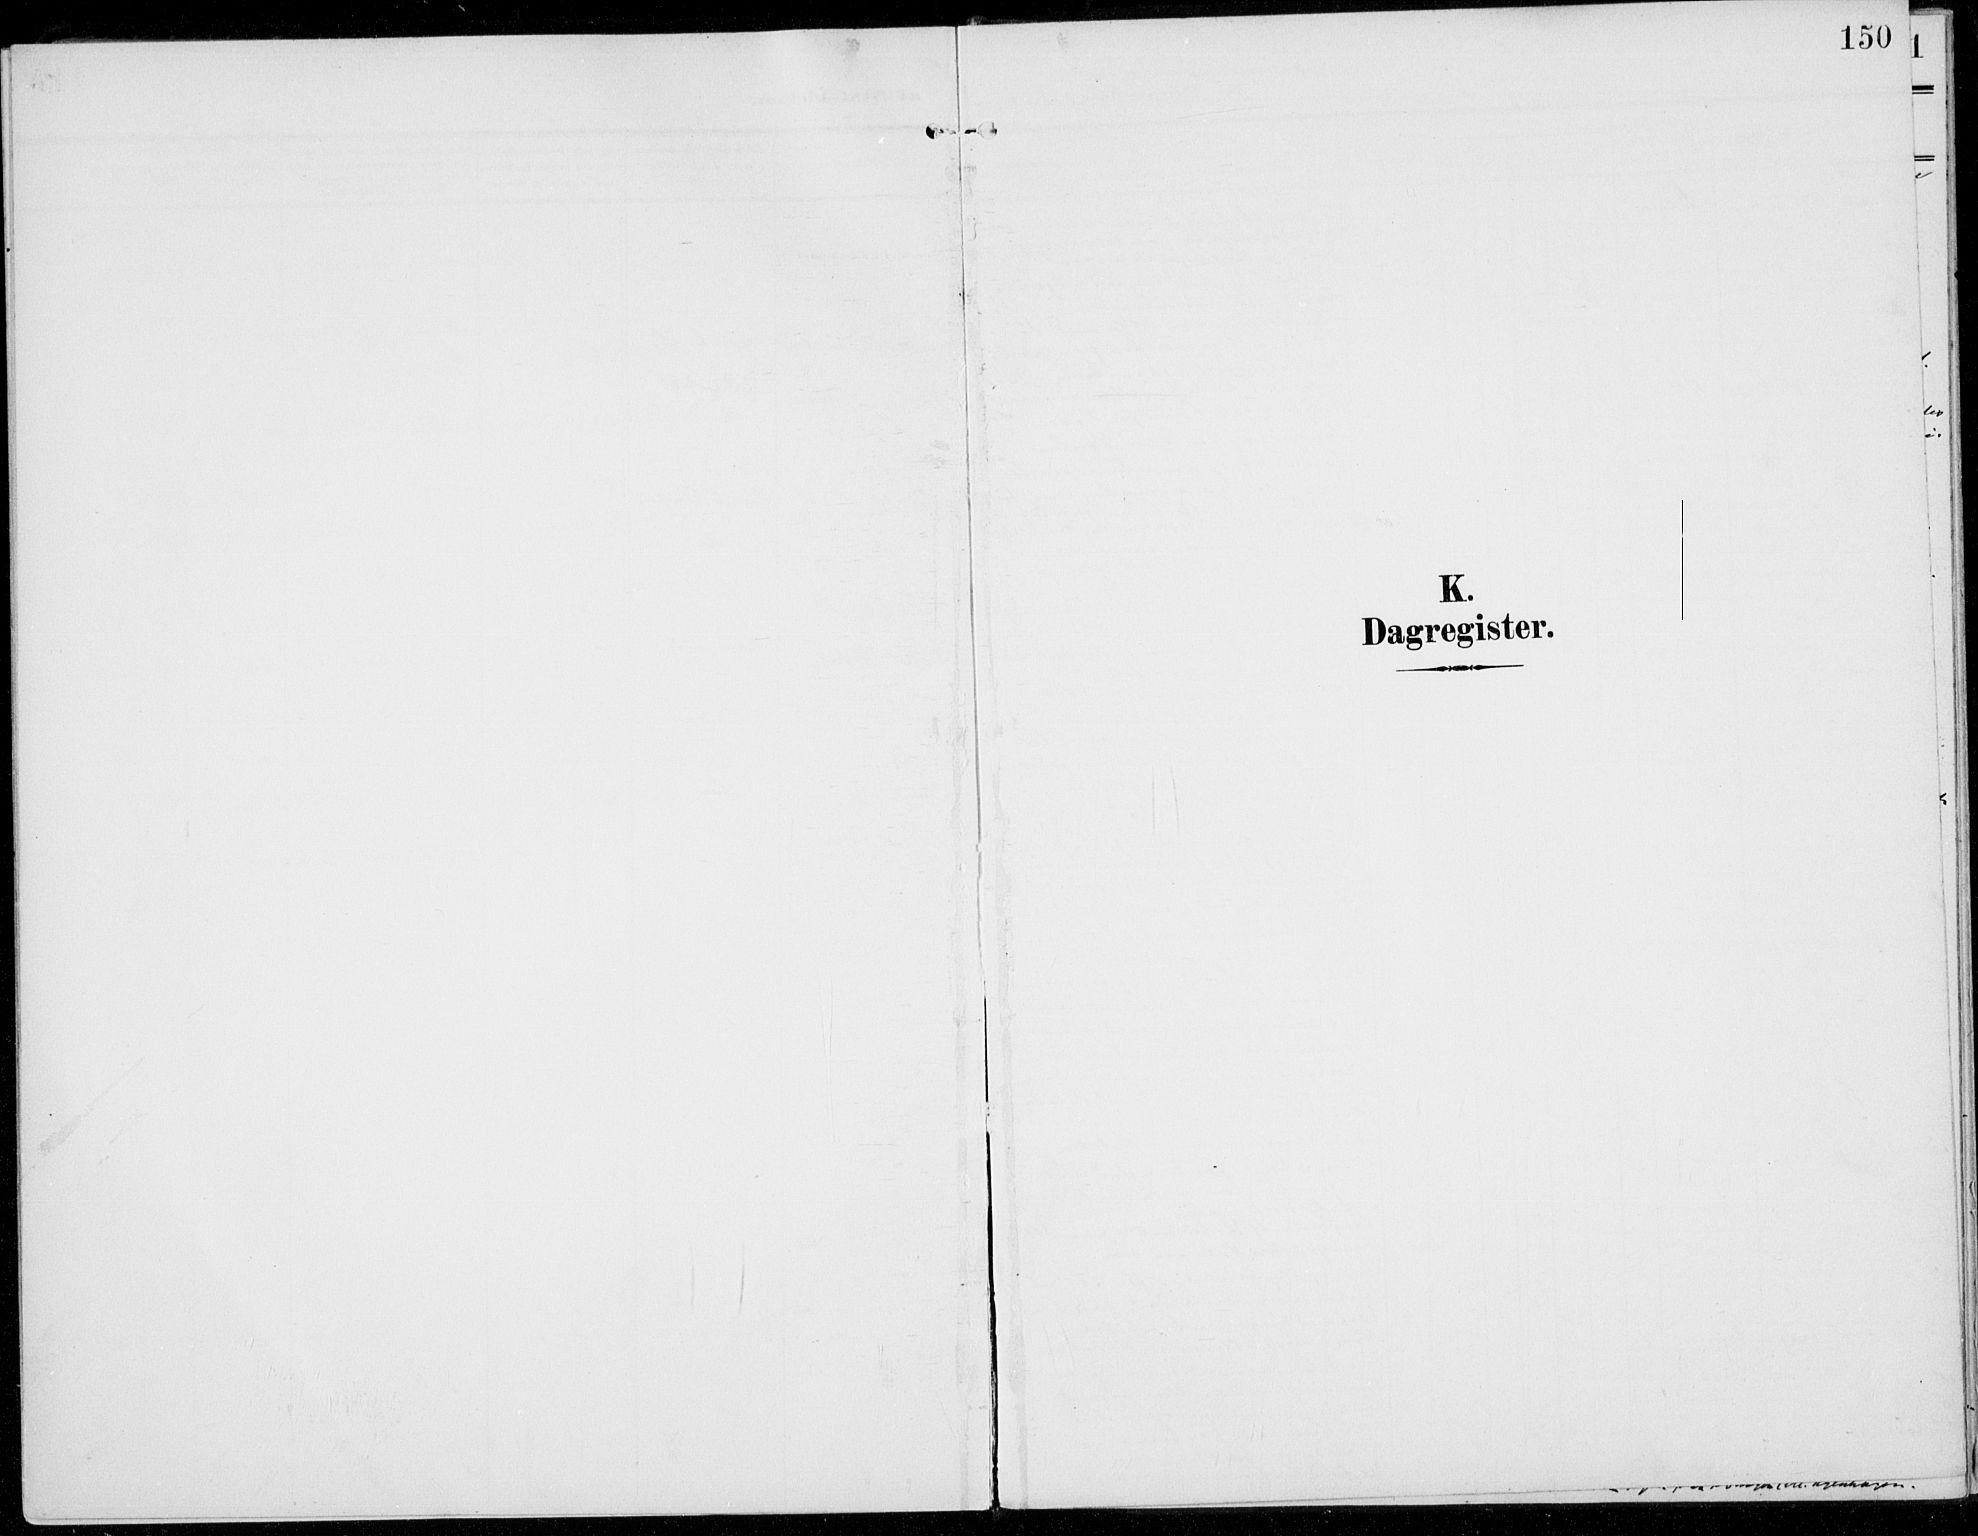 SAH, Sel prestekontor, Ministerialbok nr. 1, 1905-1922, s. 150